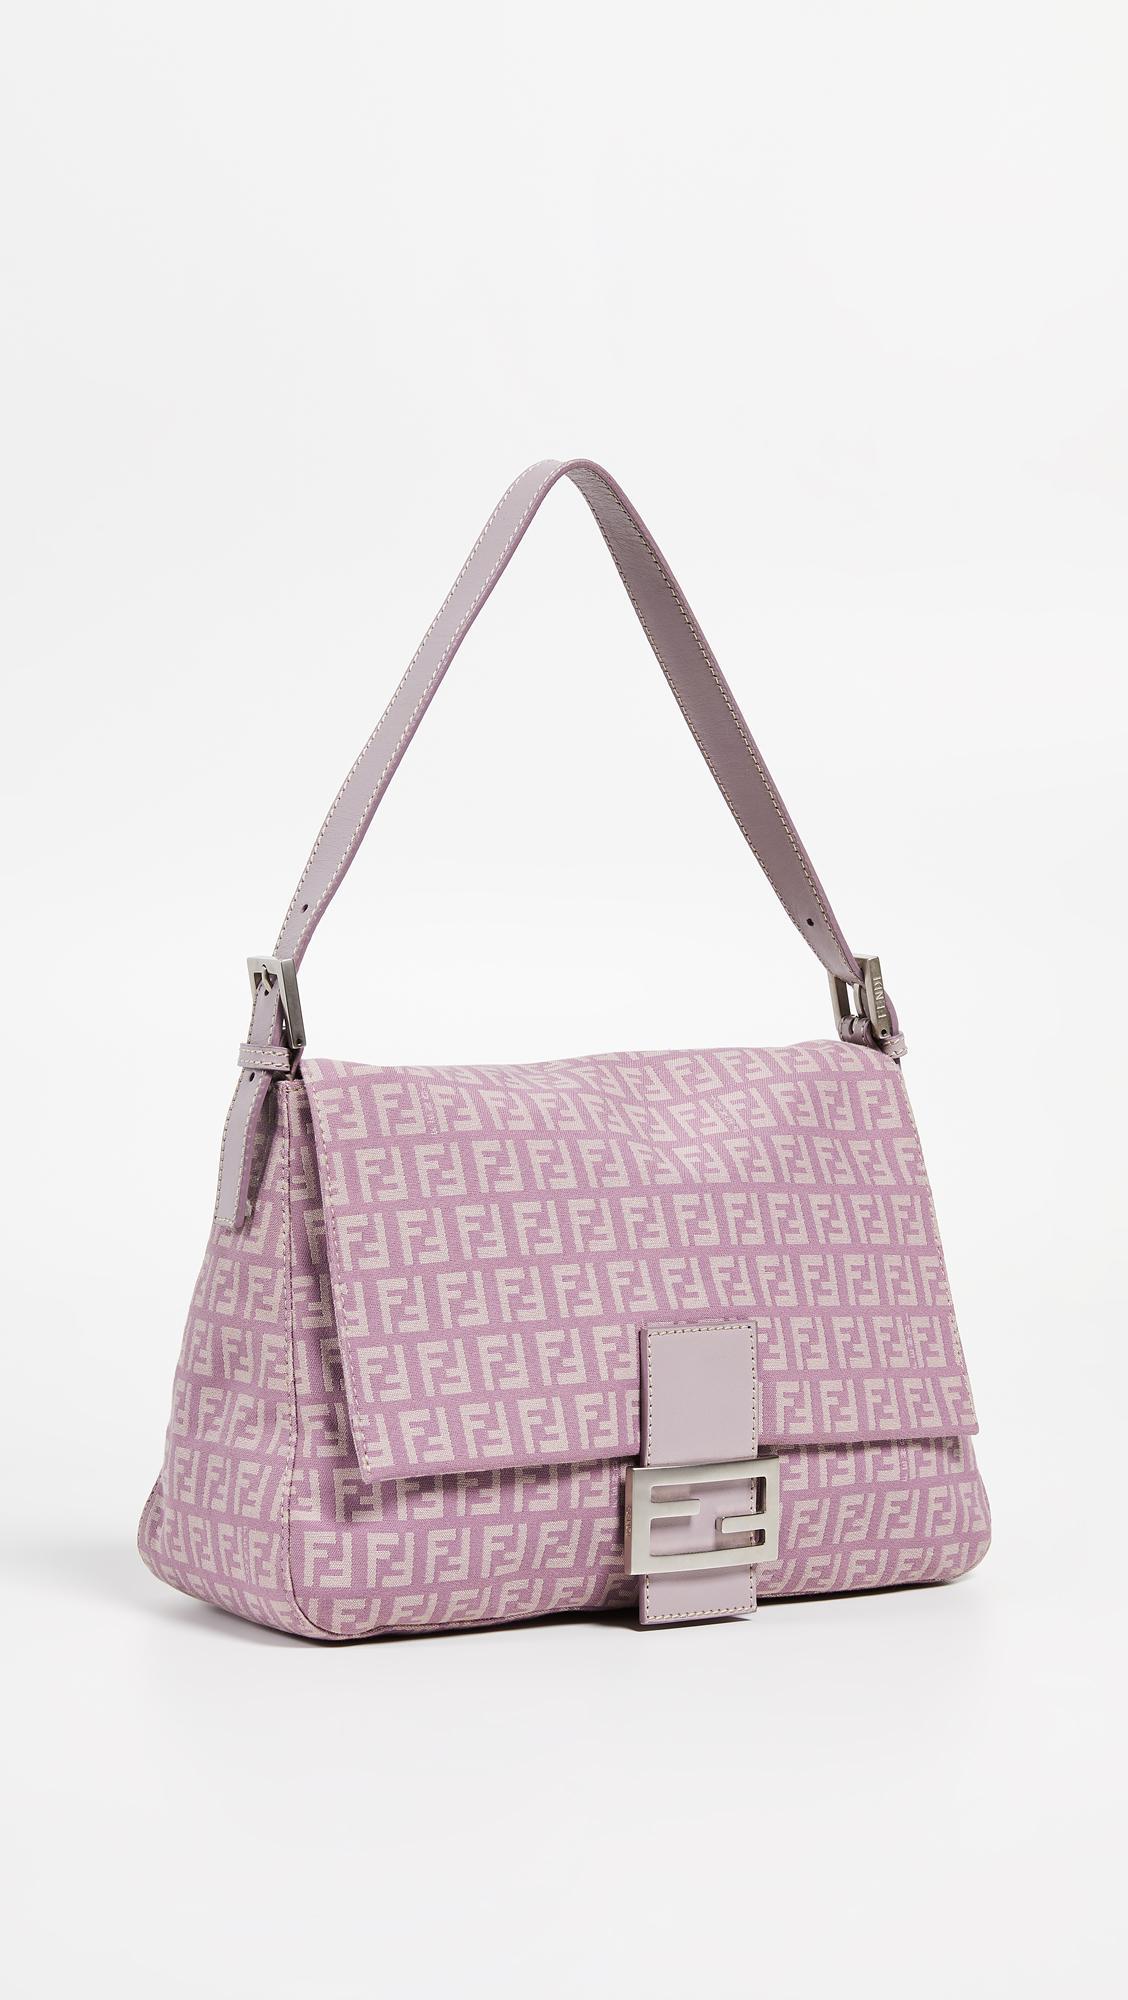 Lyst - What Goes Around Comes Around Fendi Purple Zucchino Mama Bag ... 0a34a6a93057e